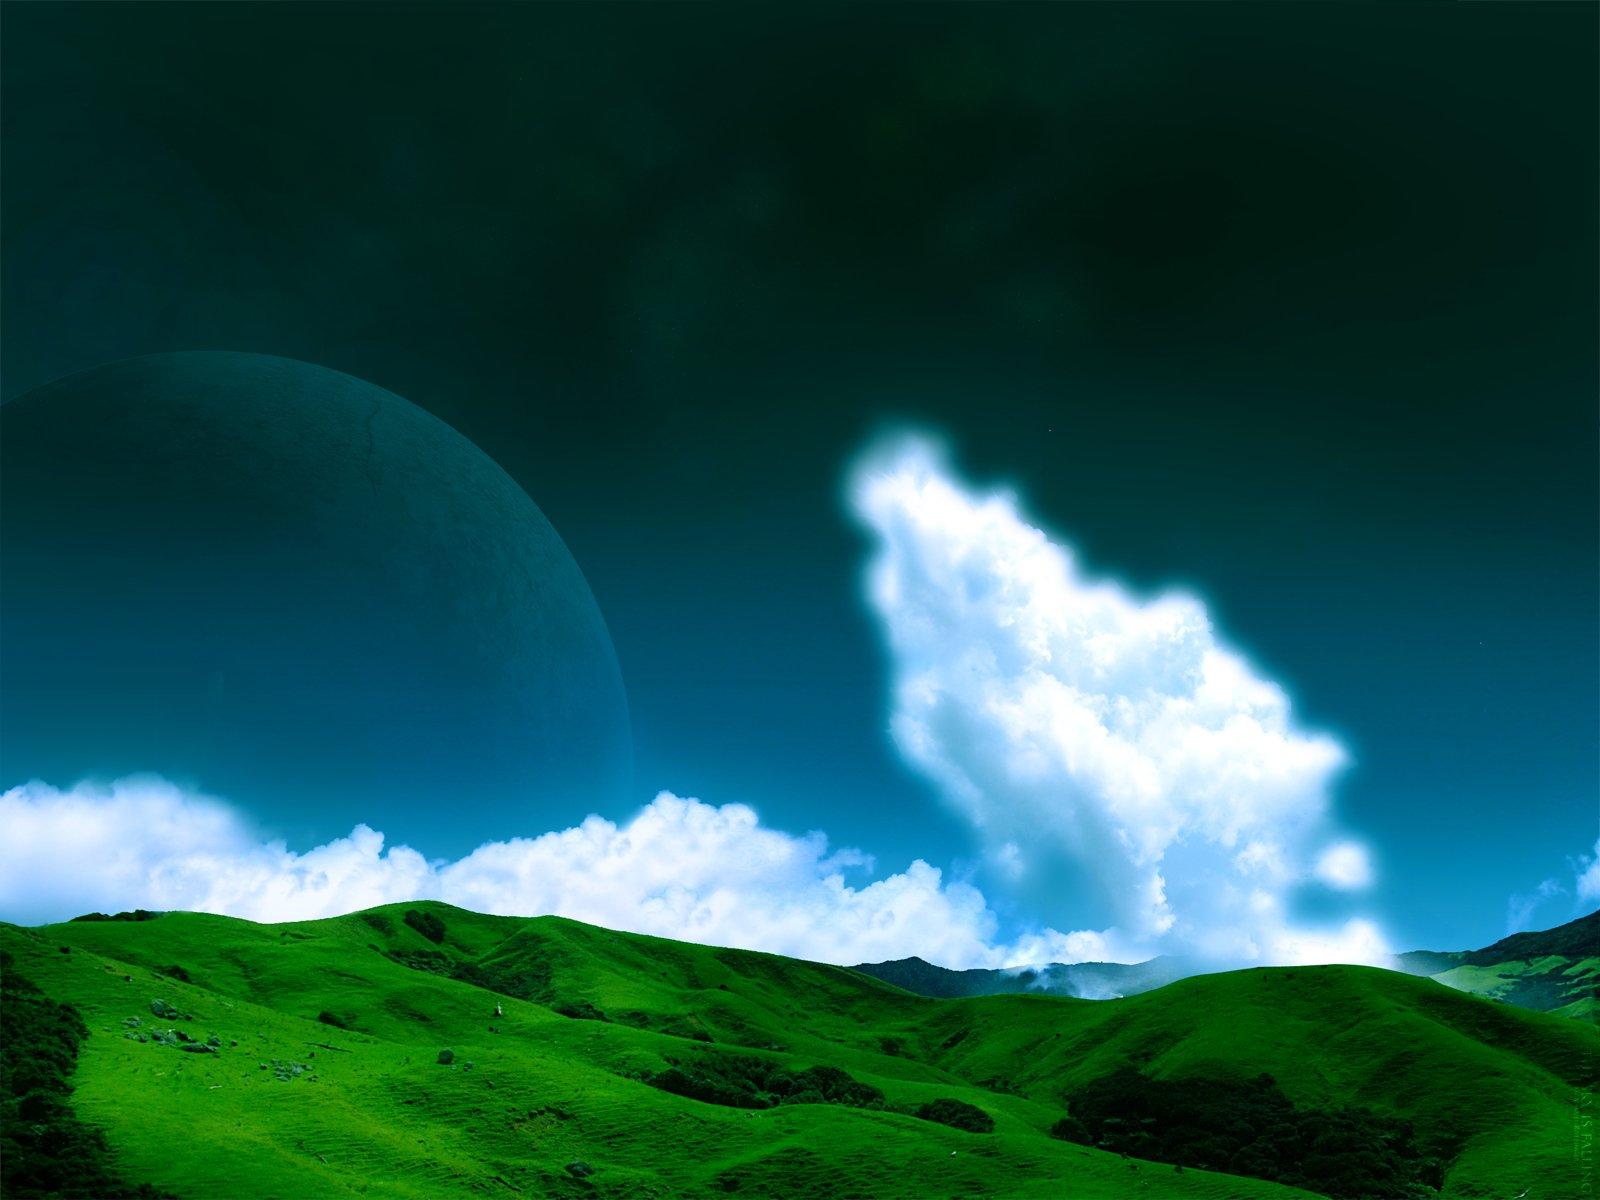 Sci Fi - Planet Rise  Earth Green Grass Cloud Planet Sky Blue Wallpaper